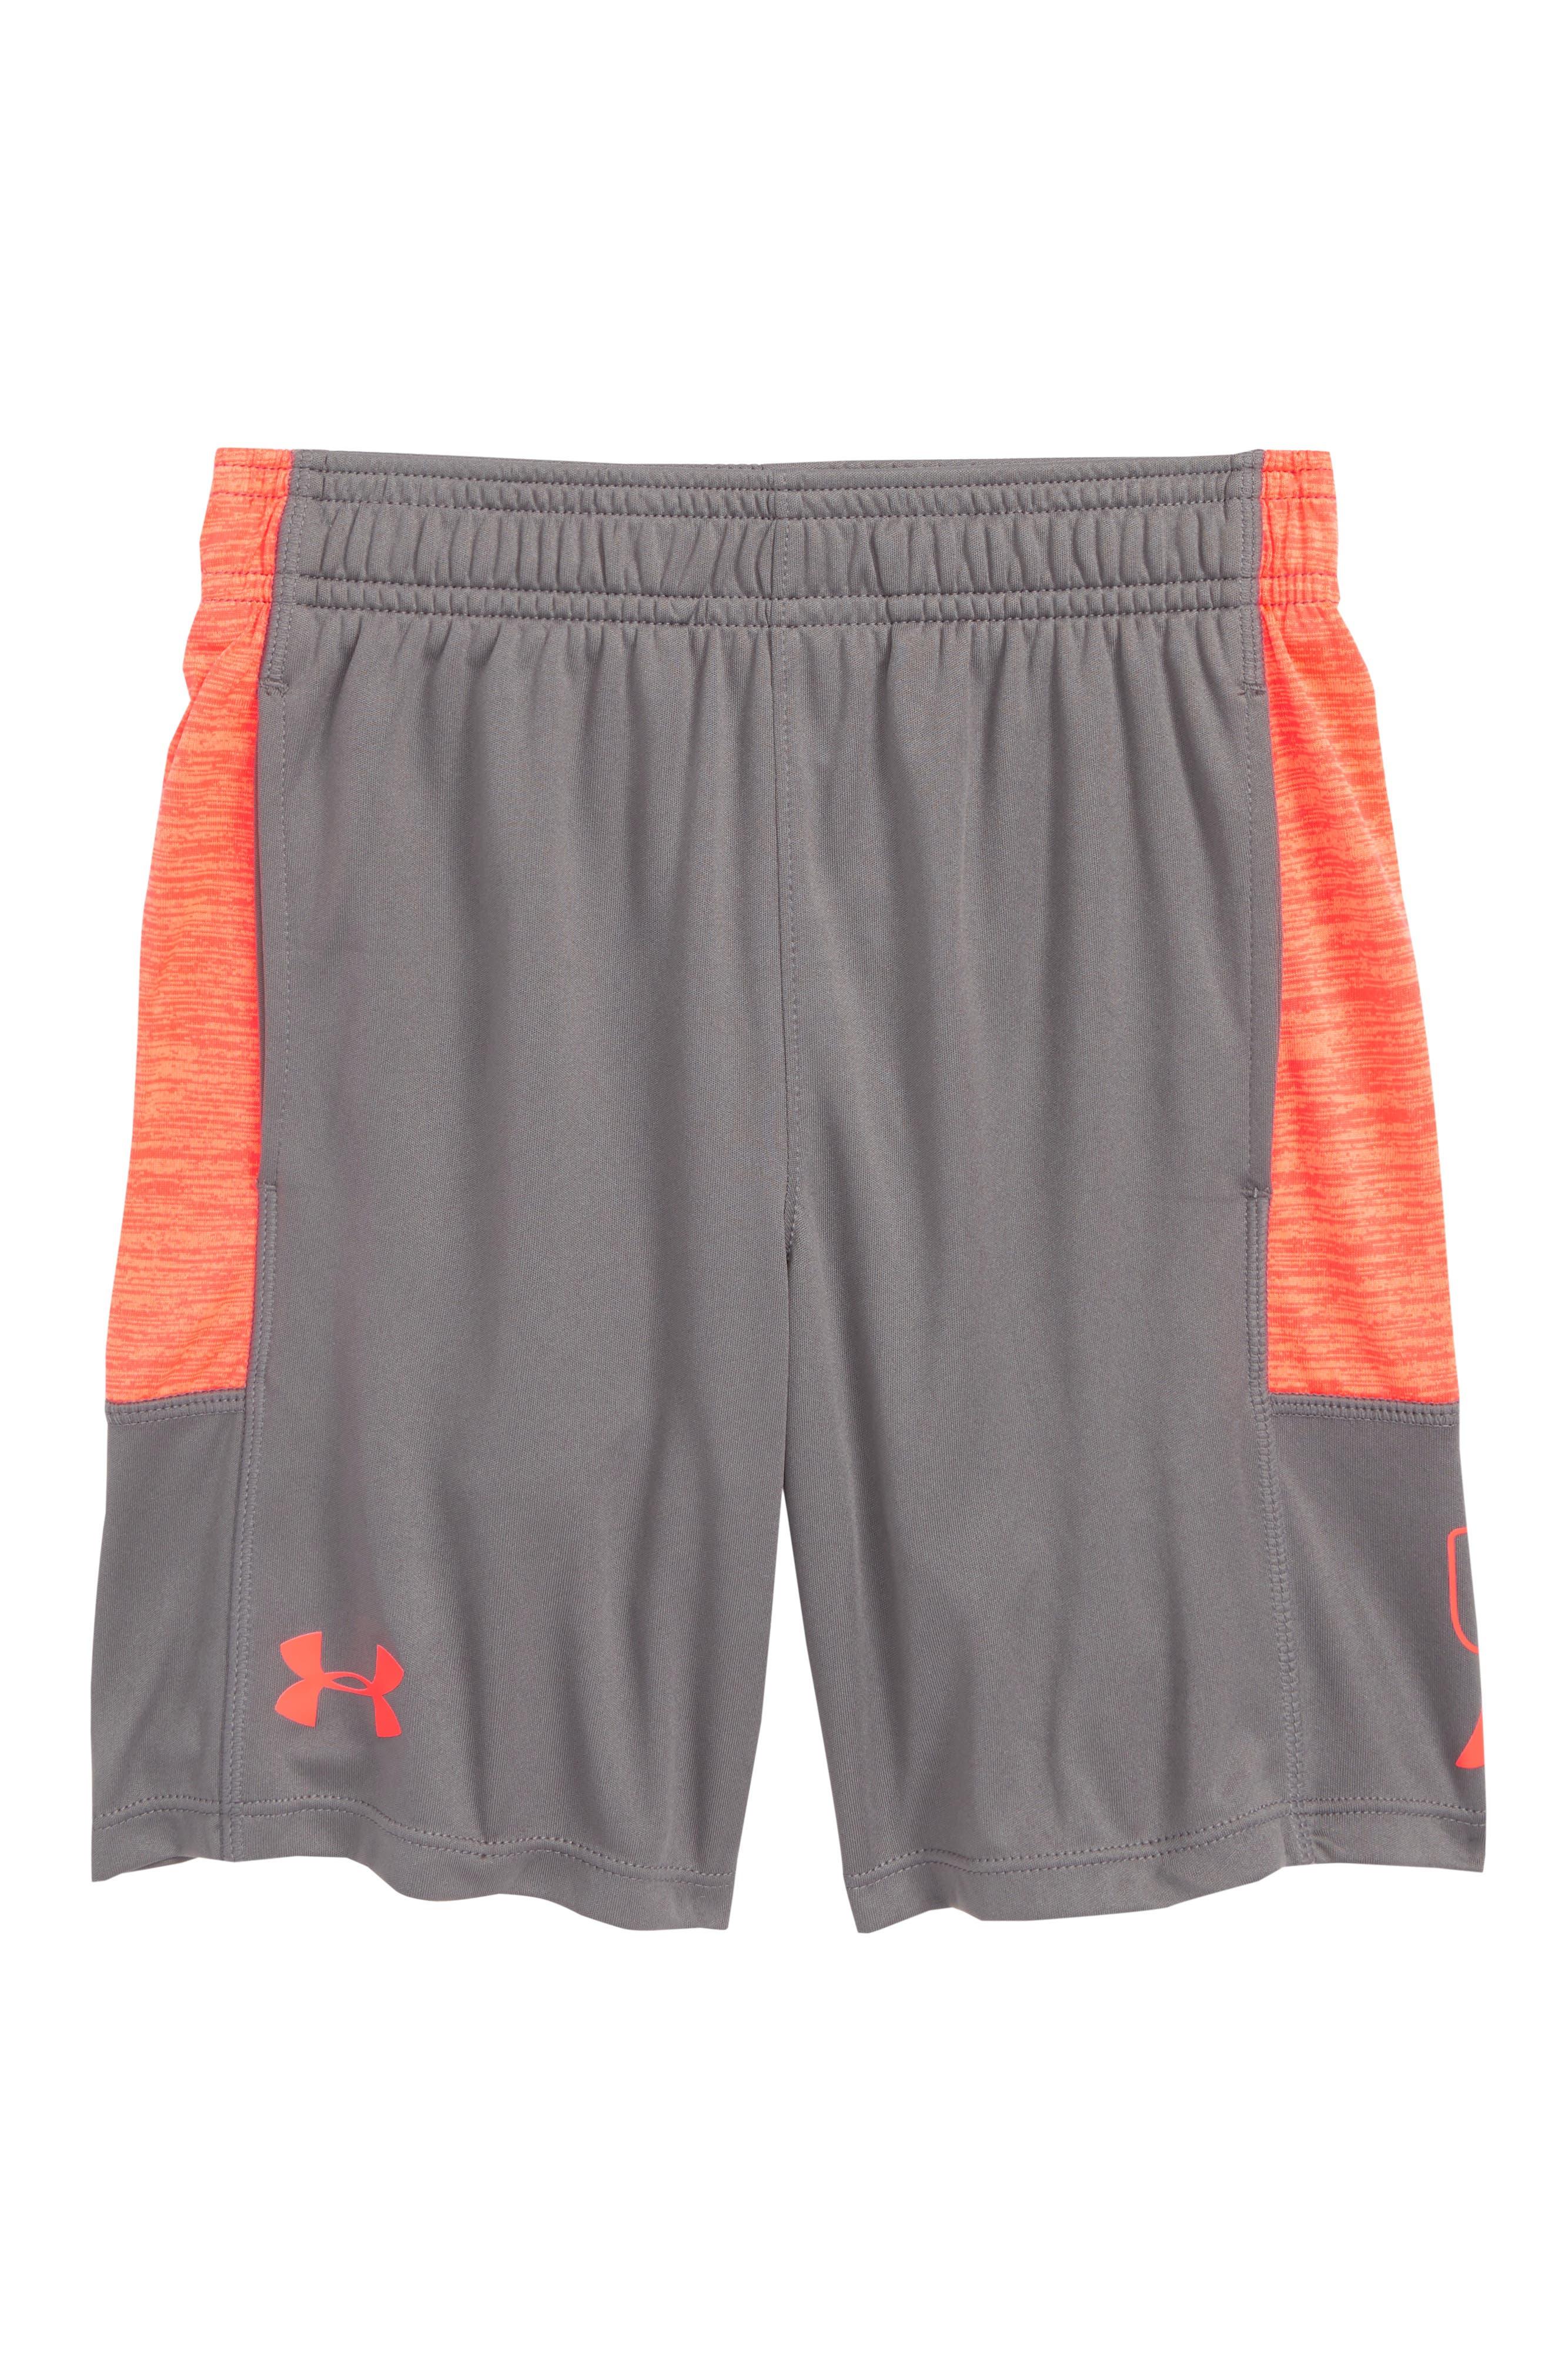 Twist Stunt HeatGear<sup>®</sup> Shorts,                         Main,                         color, Graphite/ Neon Coral